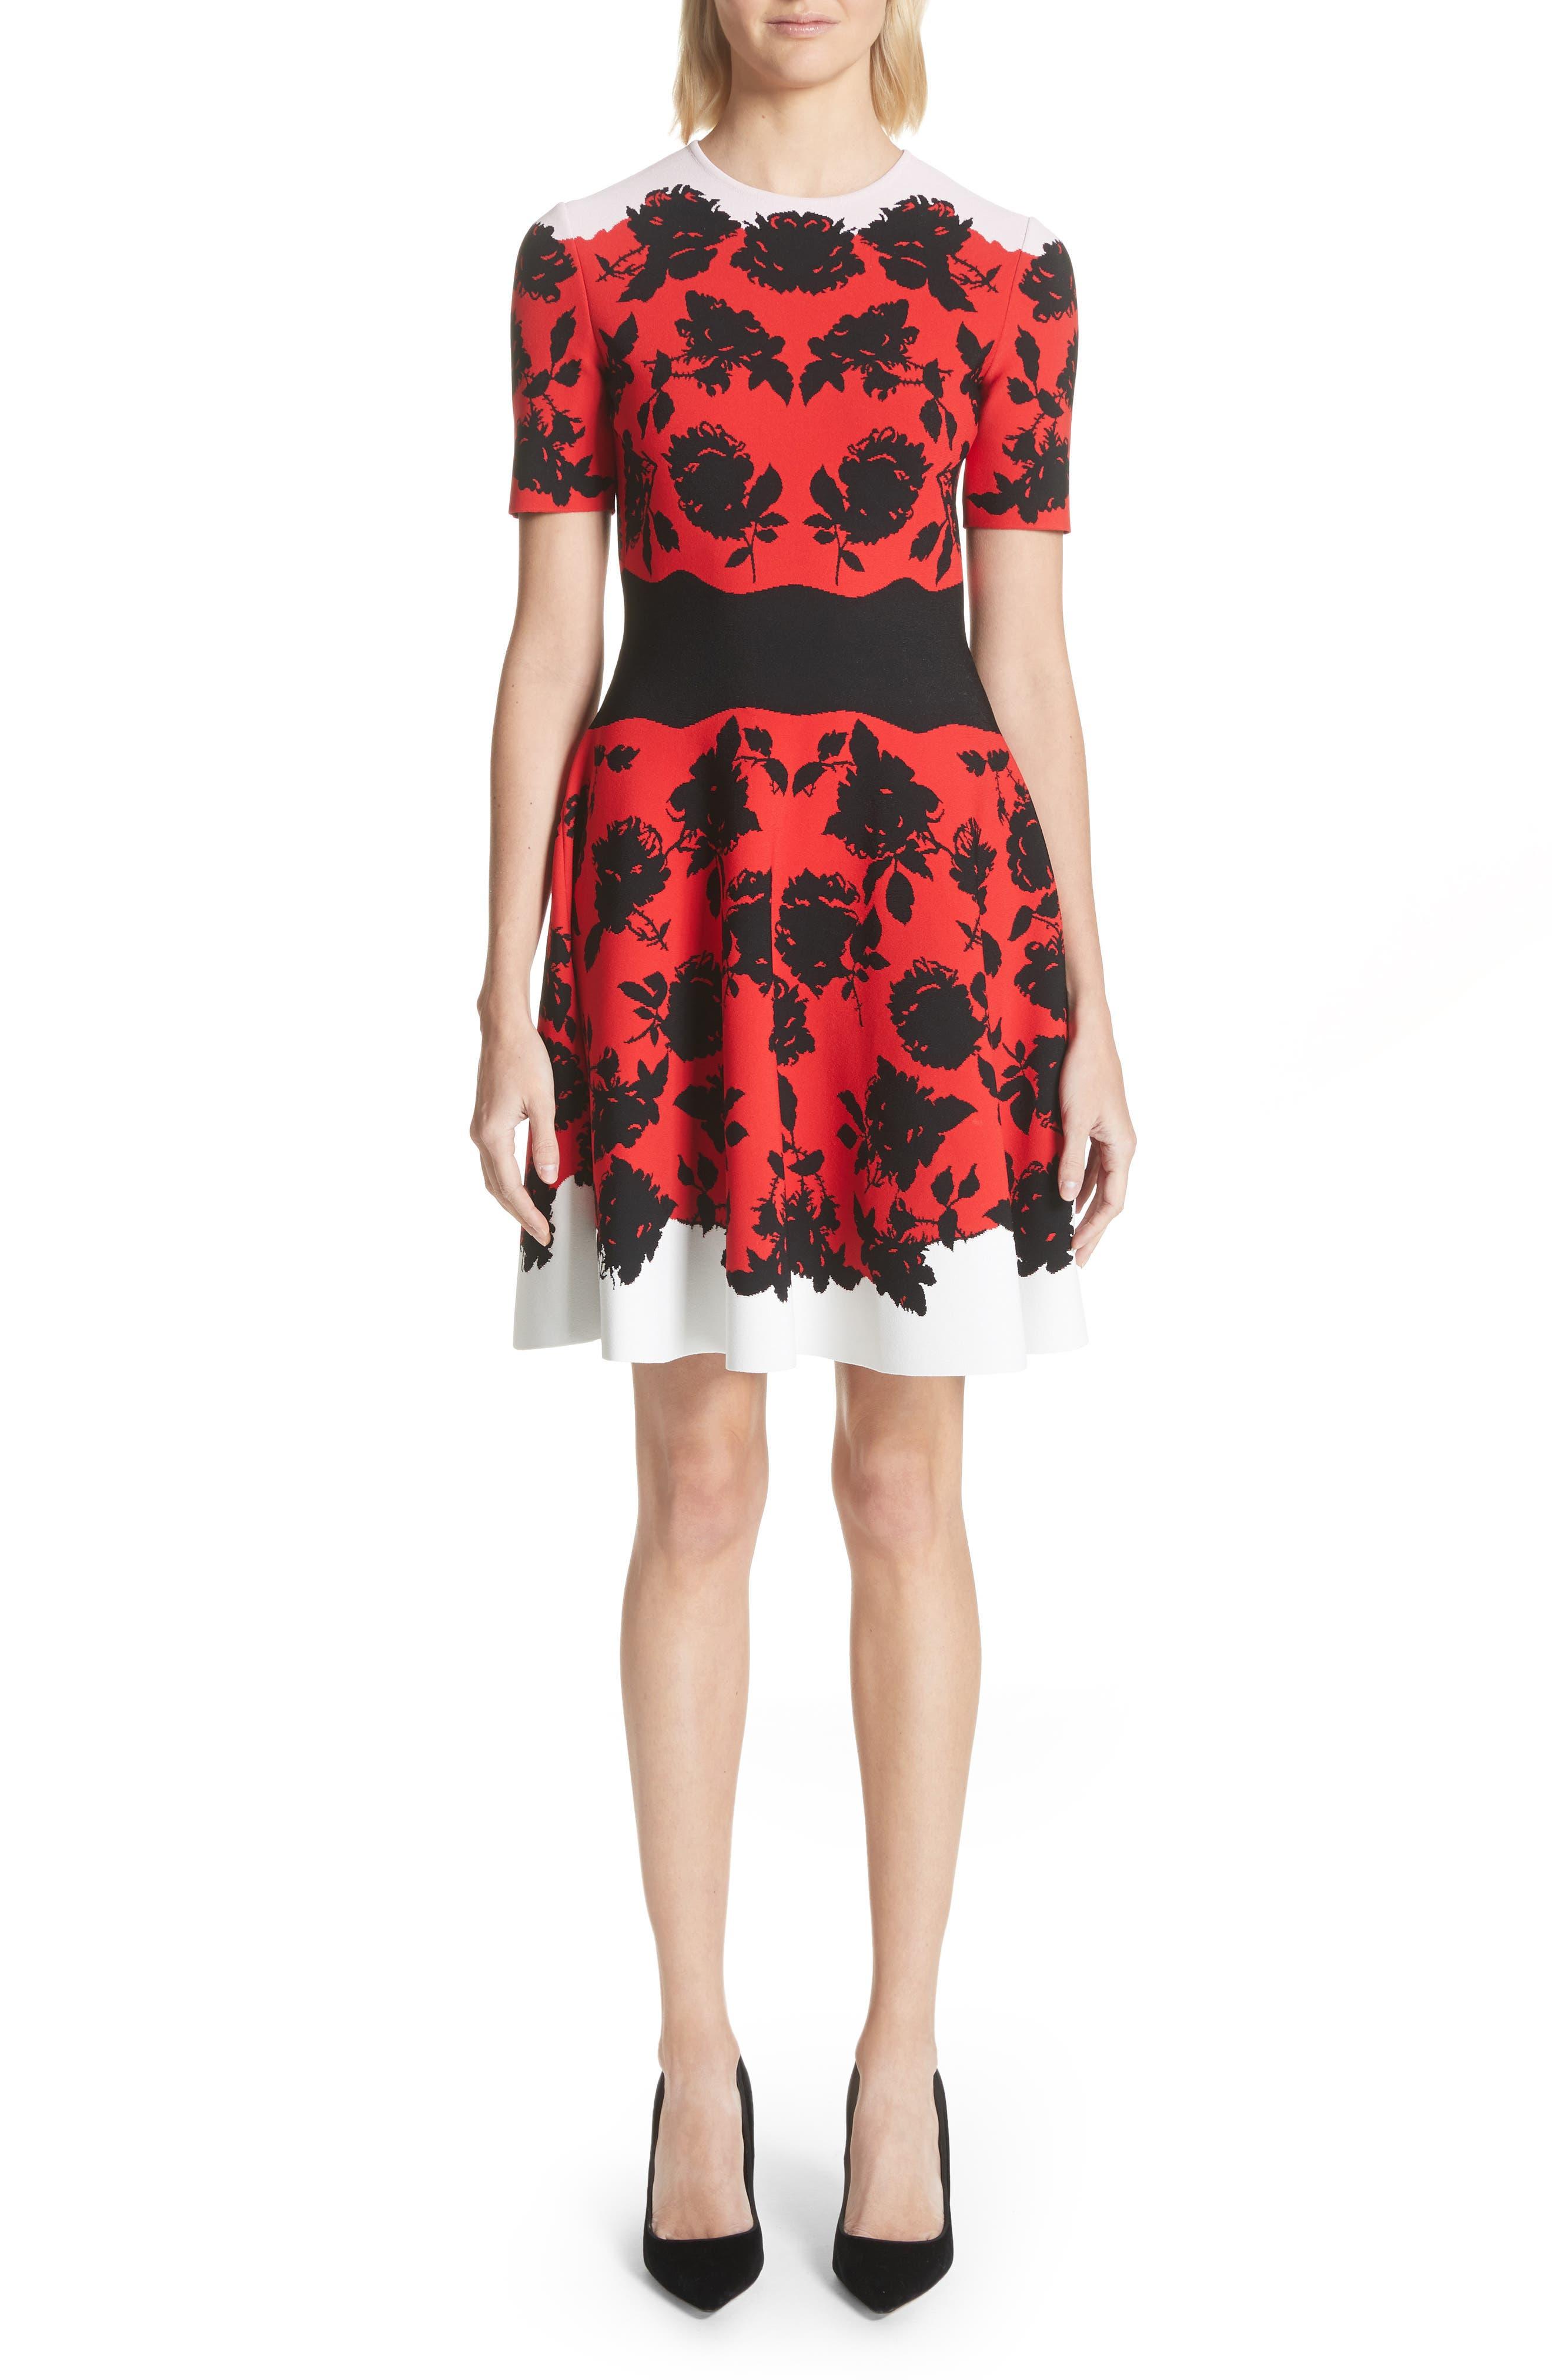 Rose Jacquard Knit Flounce Dress,                         Main,                         color, Red/ Black/ Ivory/ Pink